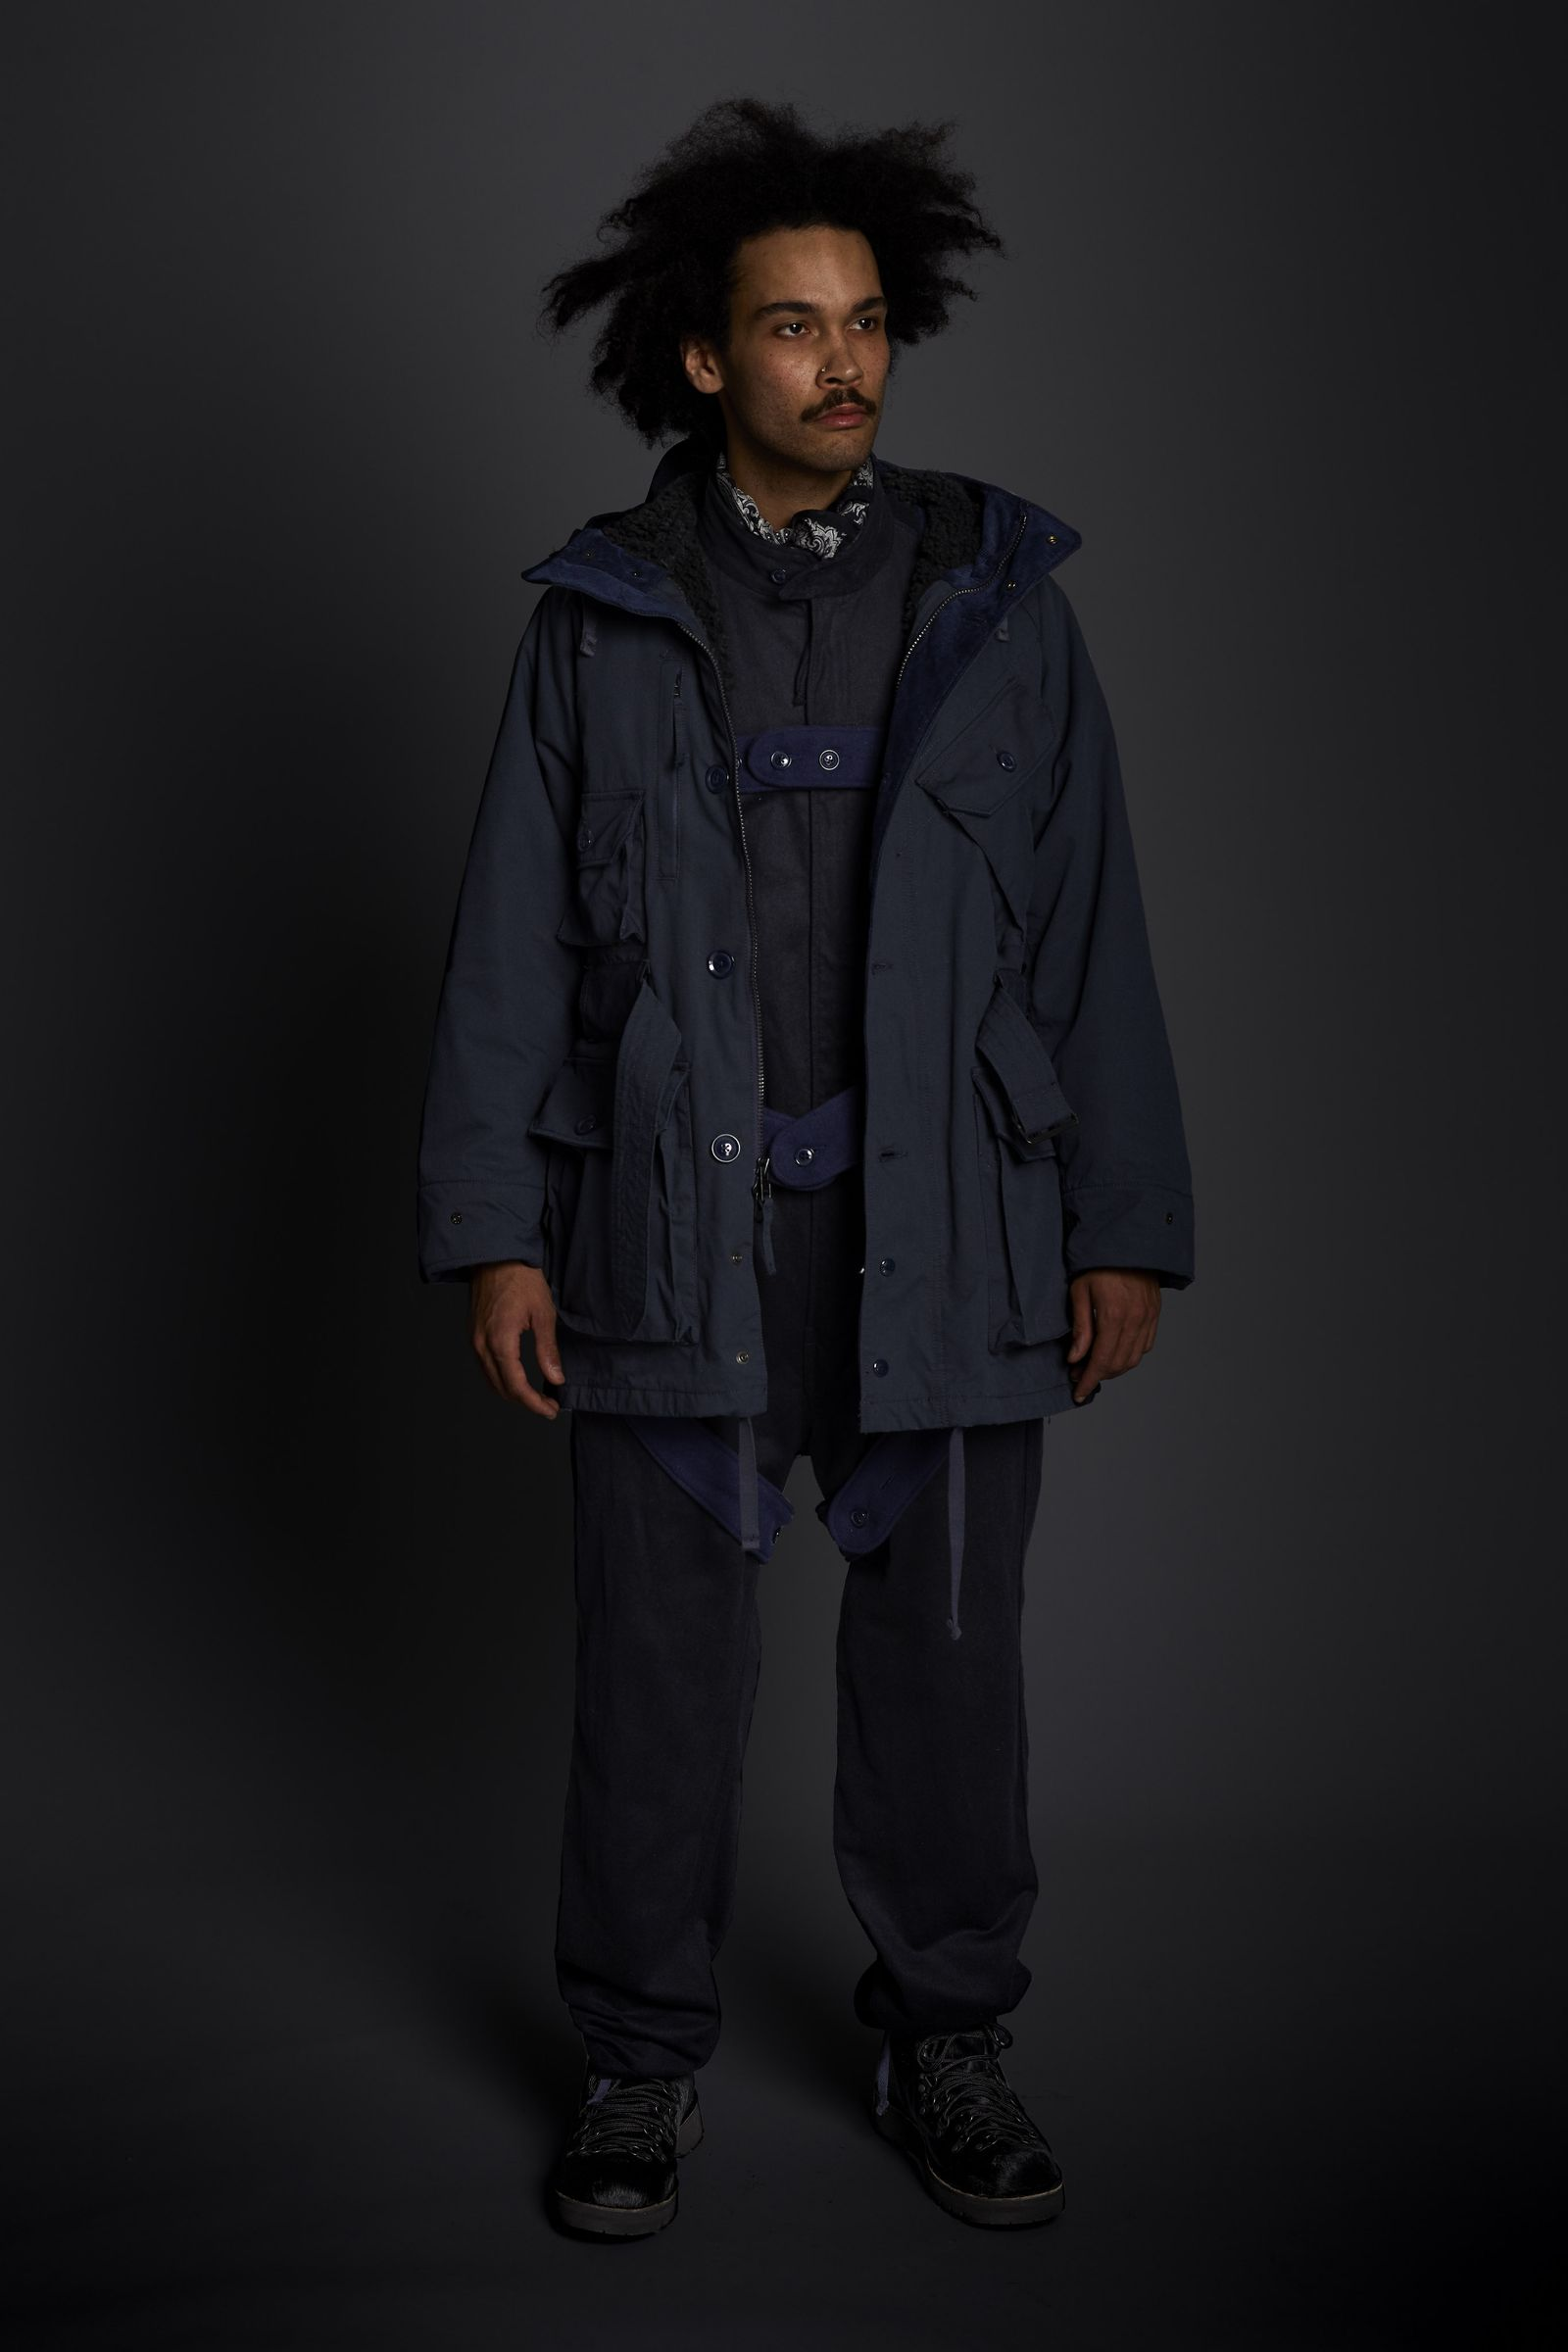 engineered-garments-fall-winter-2020-15